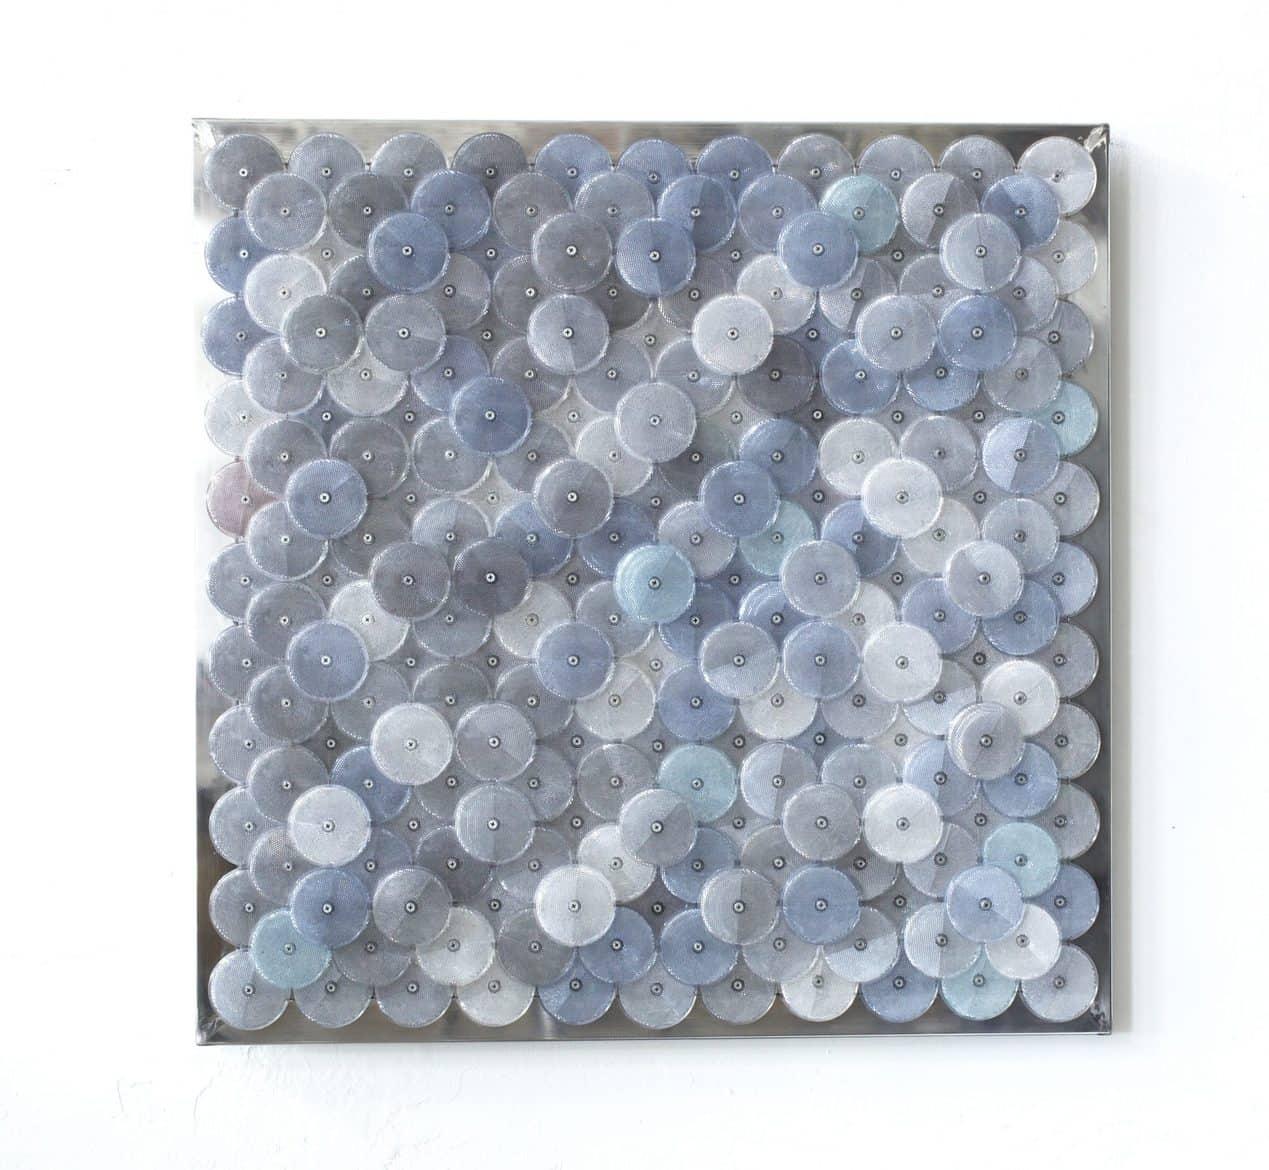 Dani Marti, 'Dust (grey)', 2019, customised corner reflectors, polished aluminium, 97 x 97 cm,